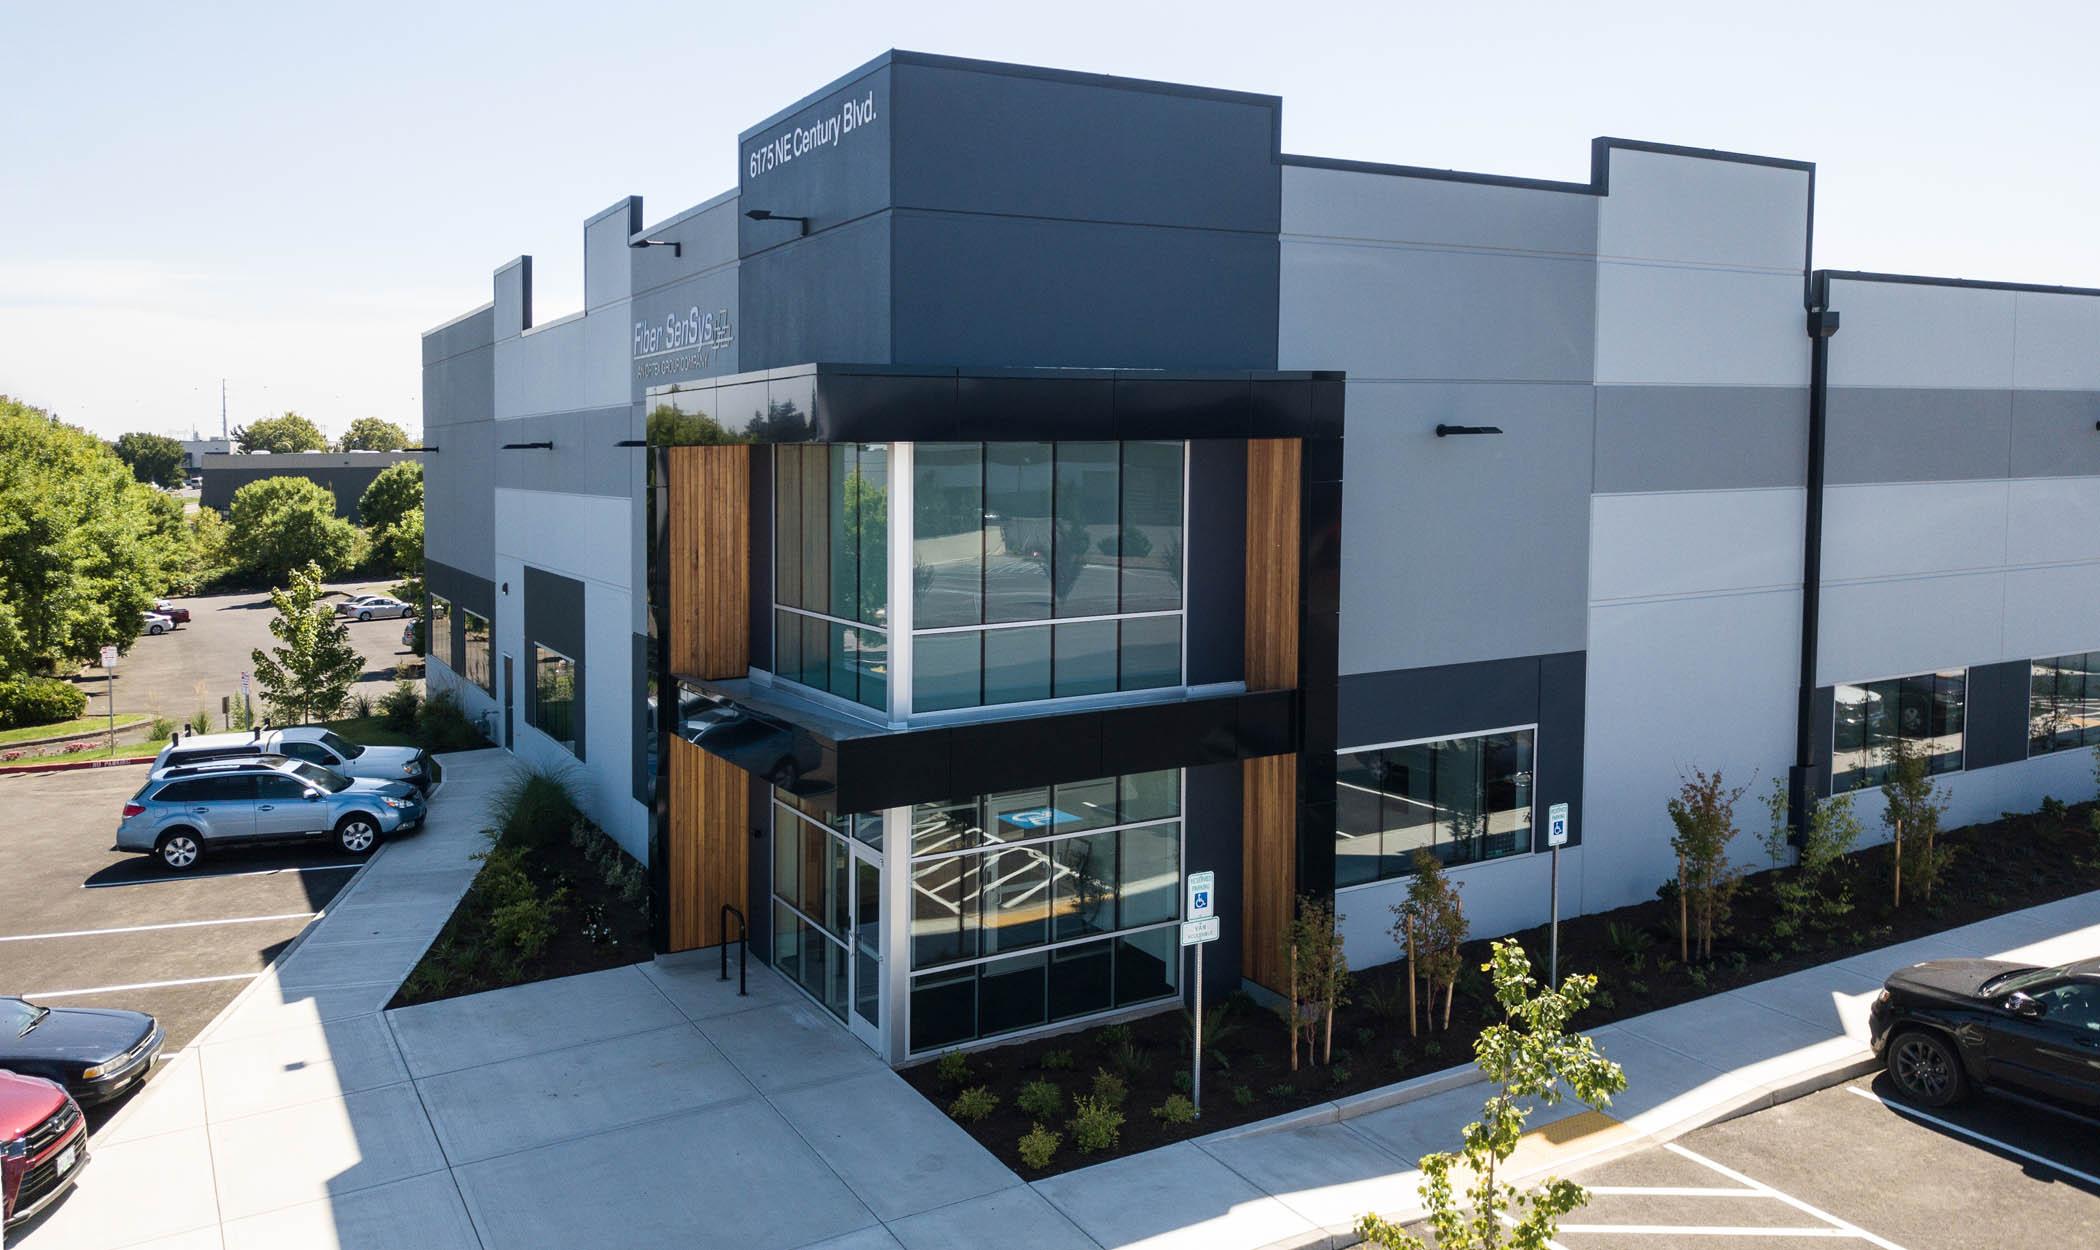 High Tech building construction Fiber SenSys exterior